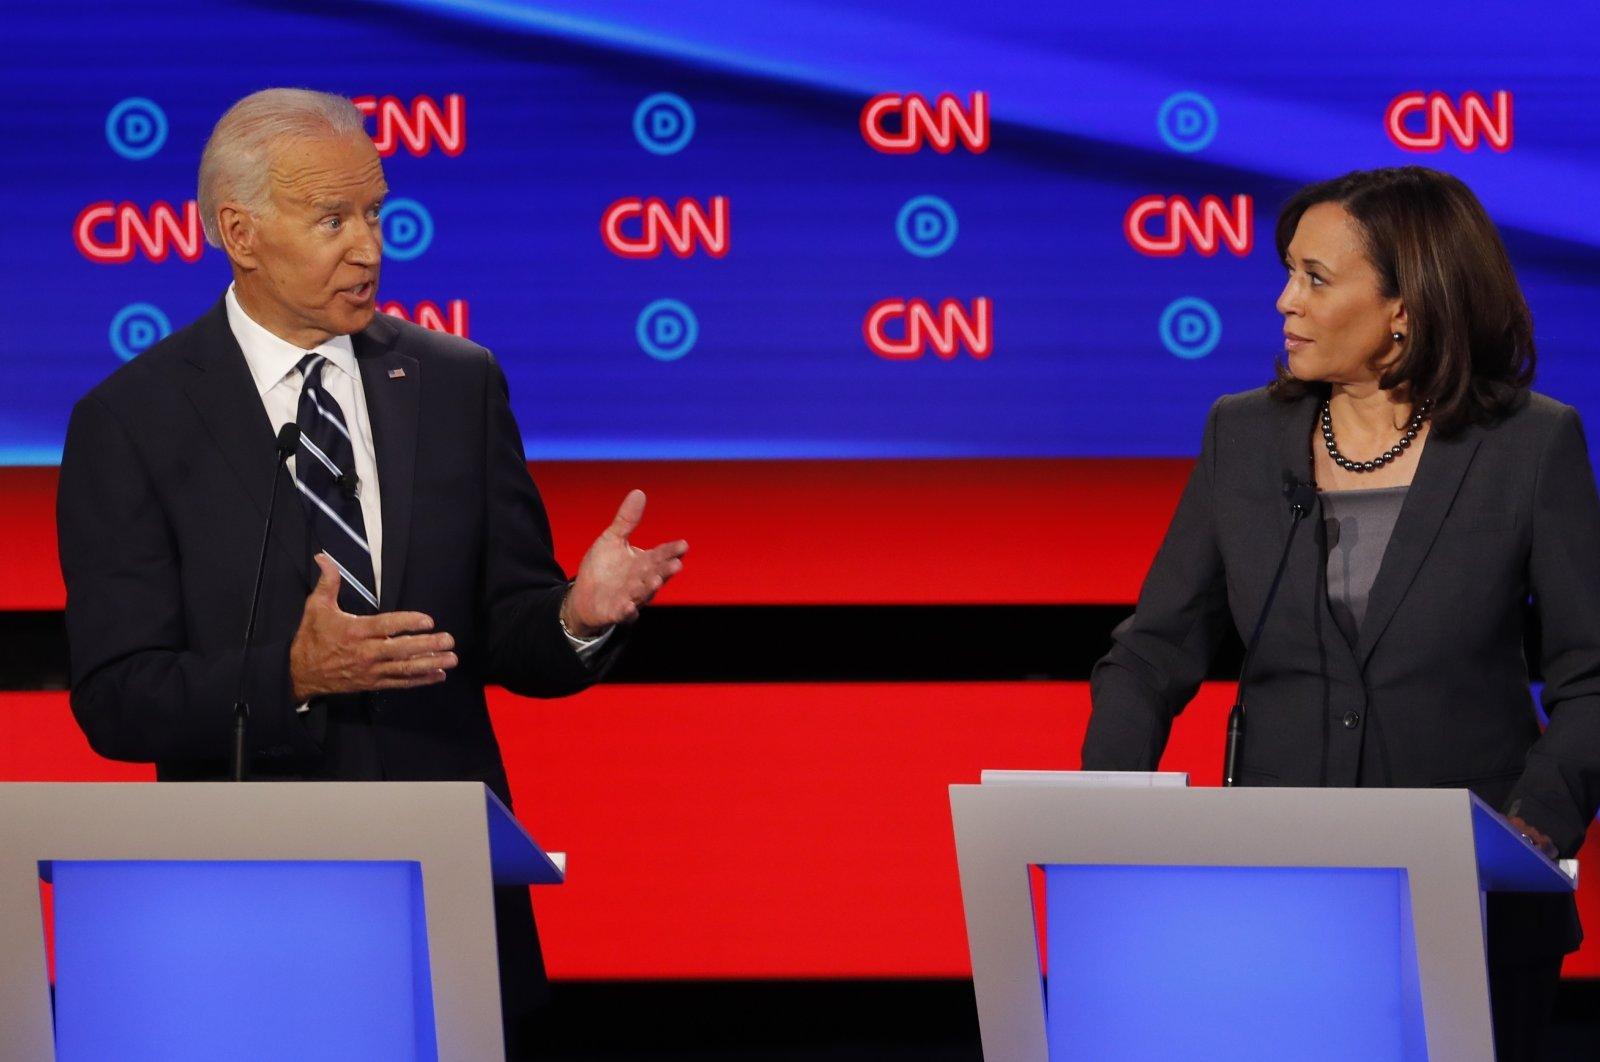 Joe Biden and Sen. Kamala Harris participate in Democratic presidential primary debates in Detroit, U.S., July 31, 2019. (AP Photo)